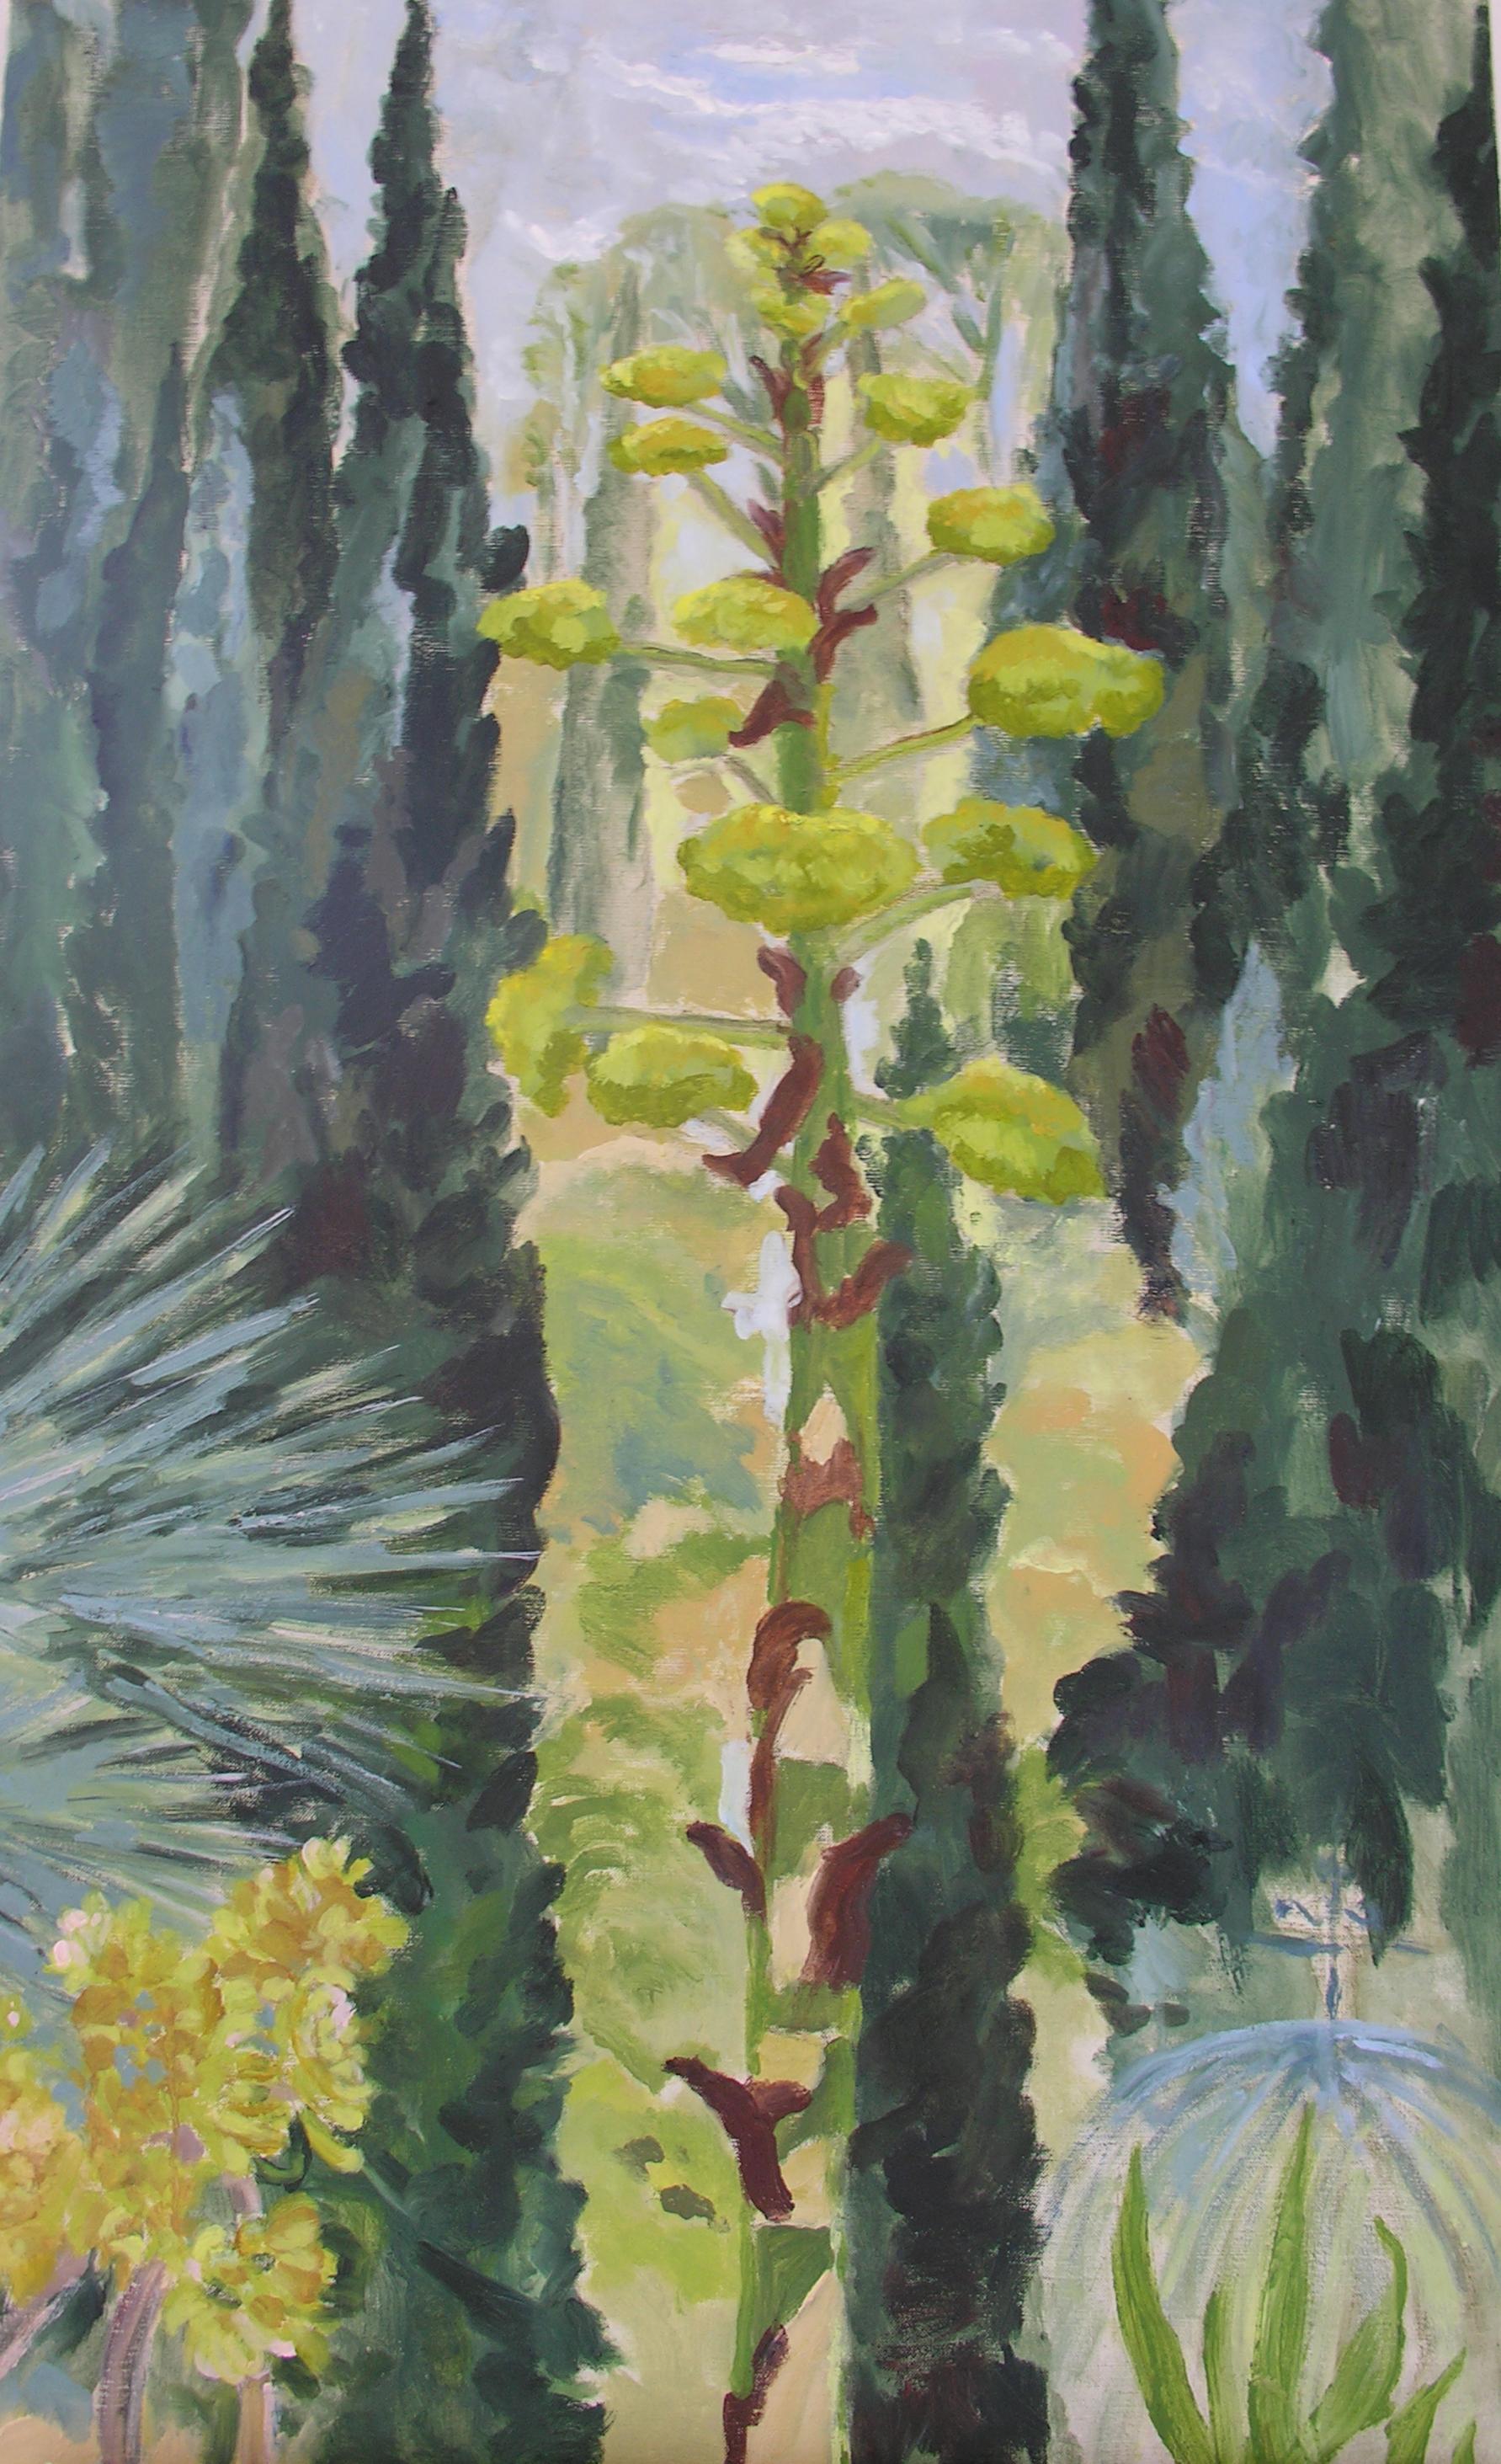 Image of - Agave Salmiana, Aeonium & Cypress